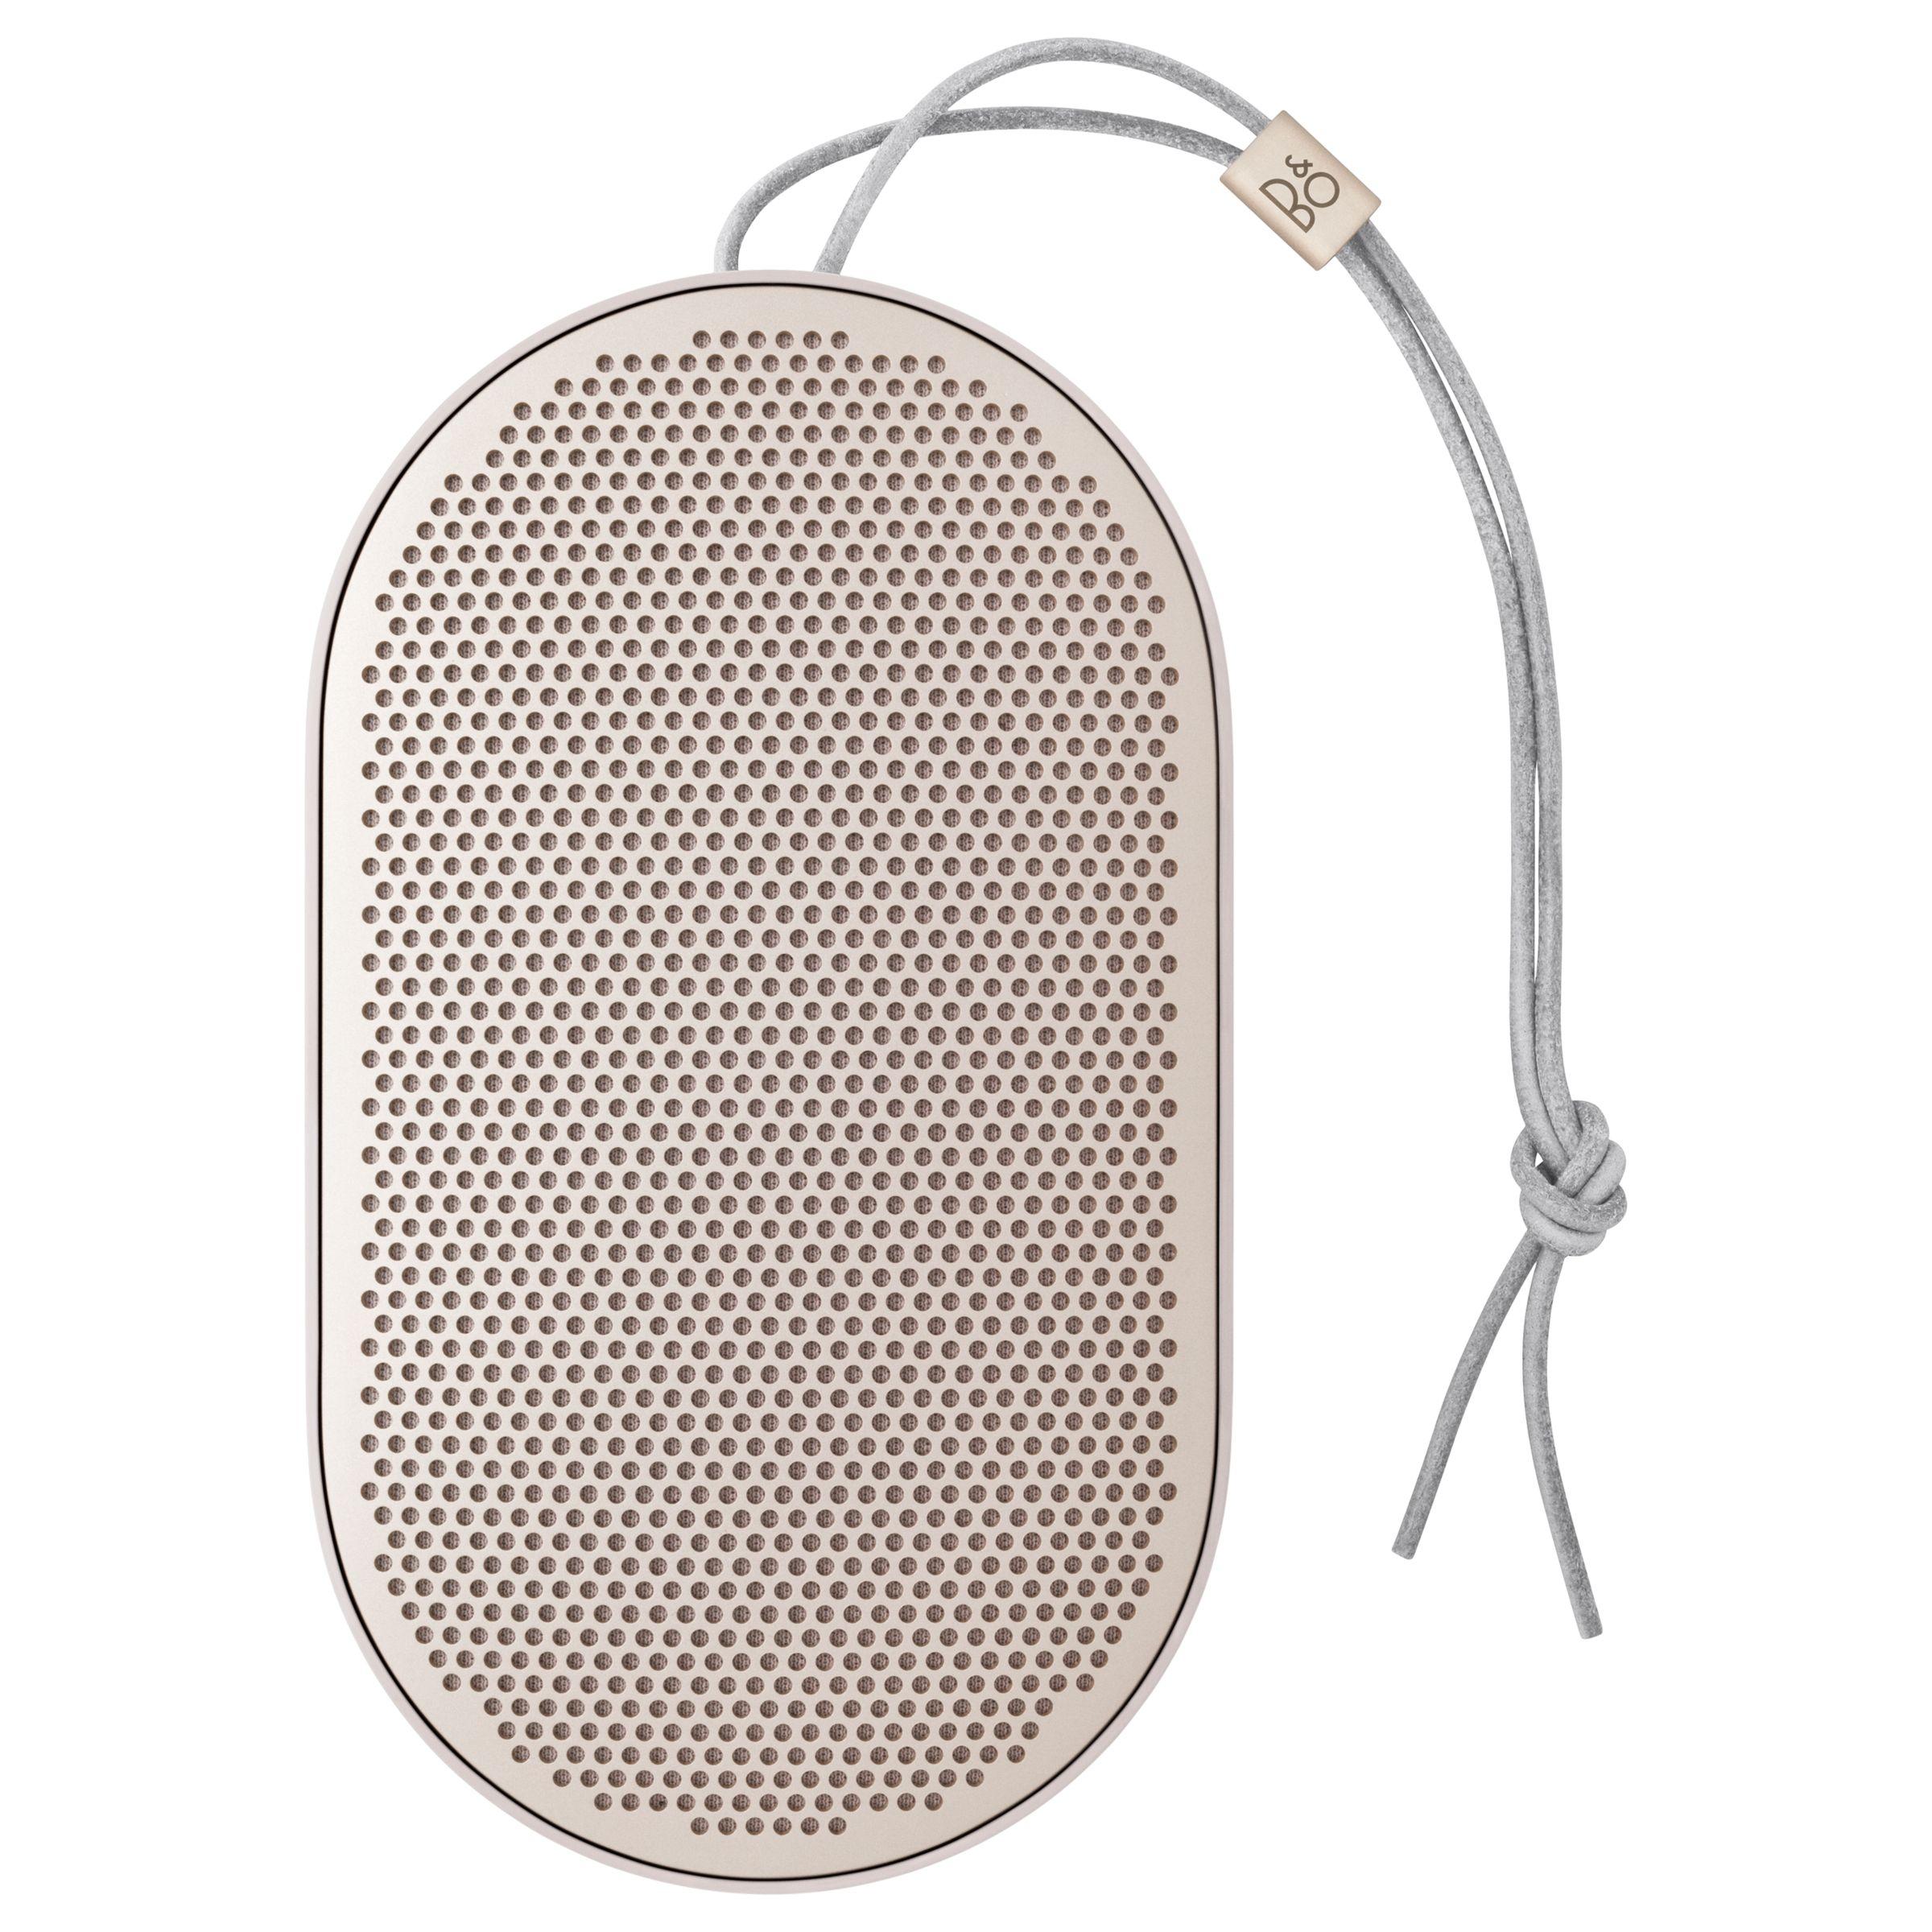 Bang & Olufsen Bang & Olufsen Beoplay P2 Portable Splash-Resistant Bluetooth Speaker